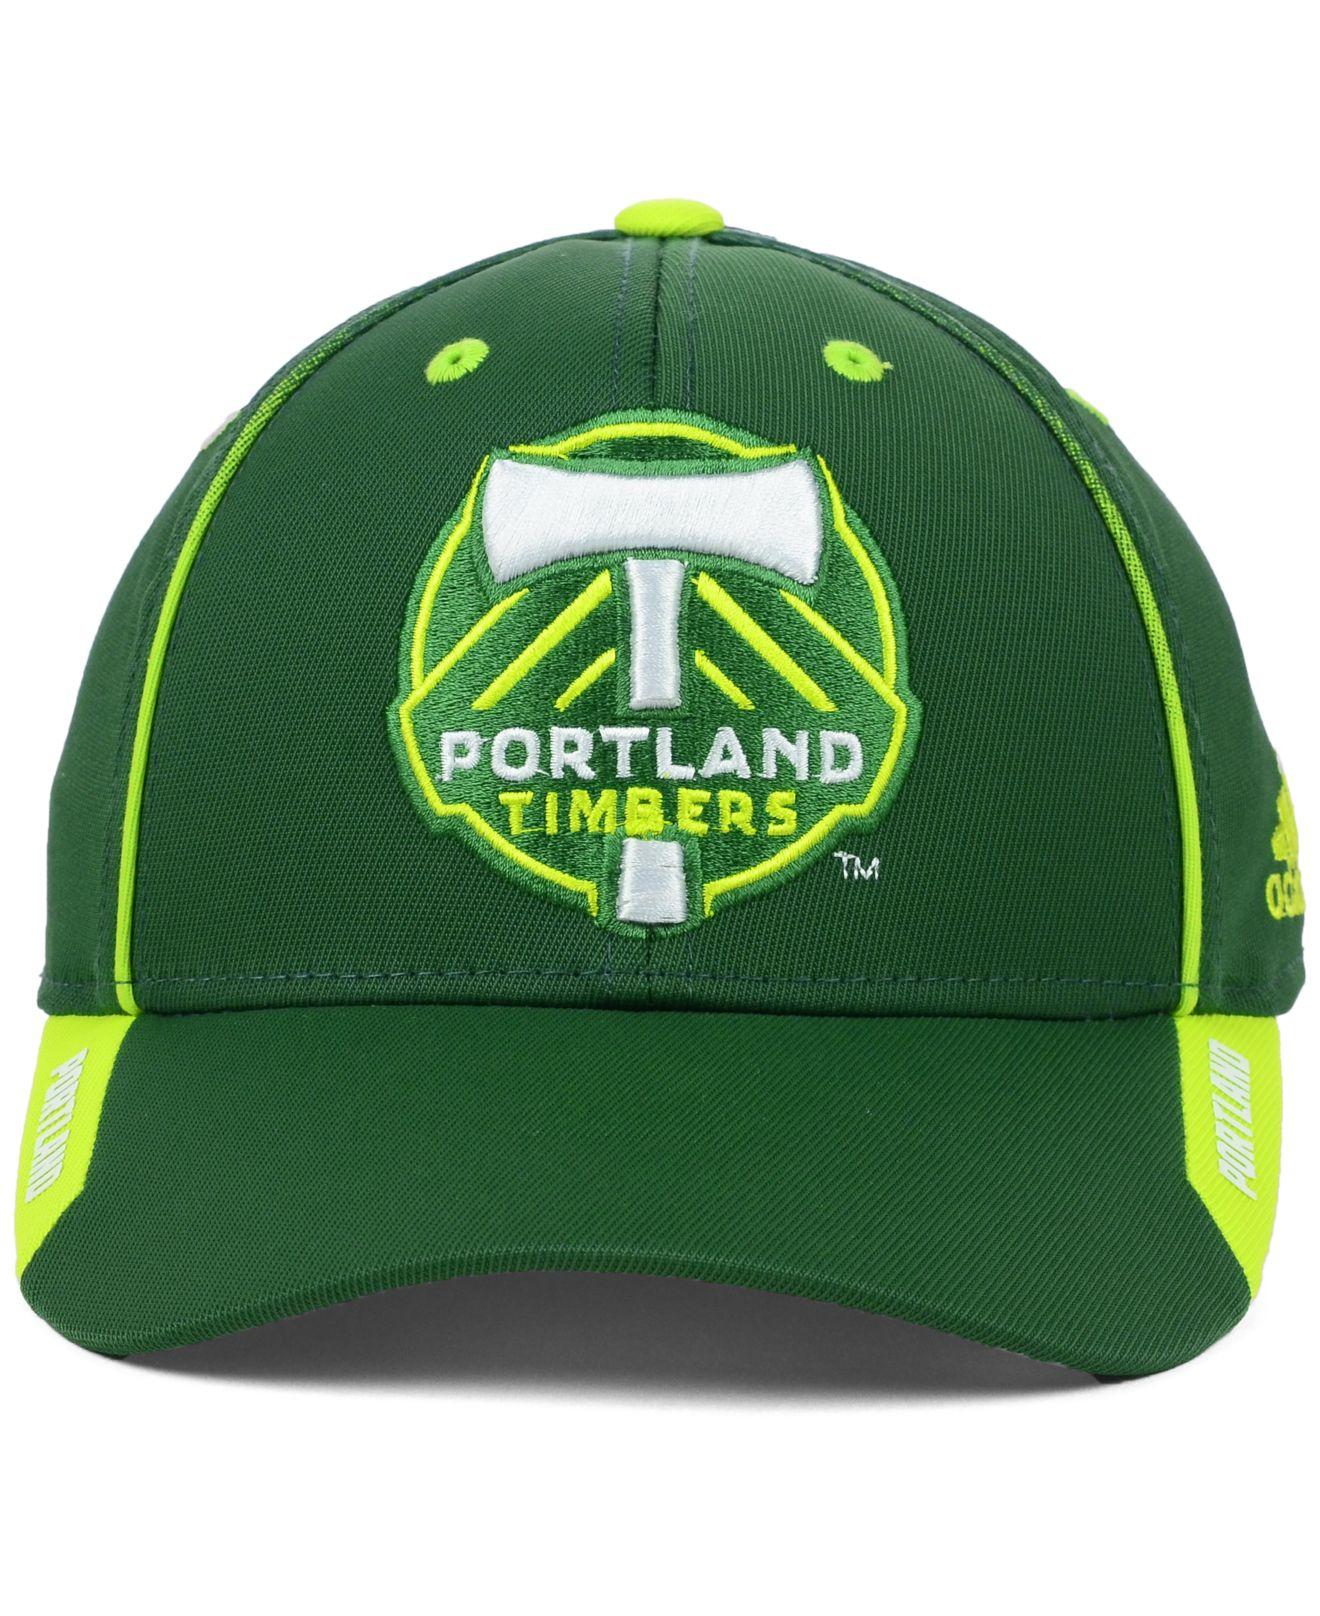 Portland Timbers: Adidas Portland Timbers Mls Mid Fielder Cap In